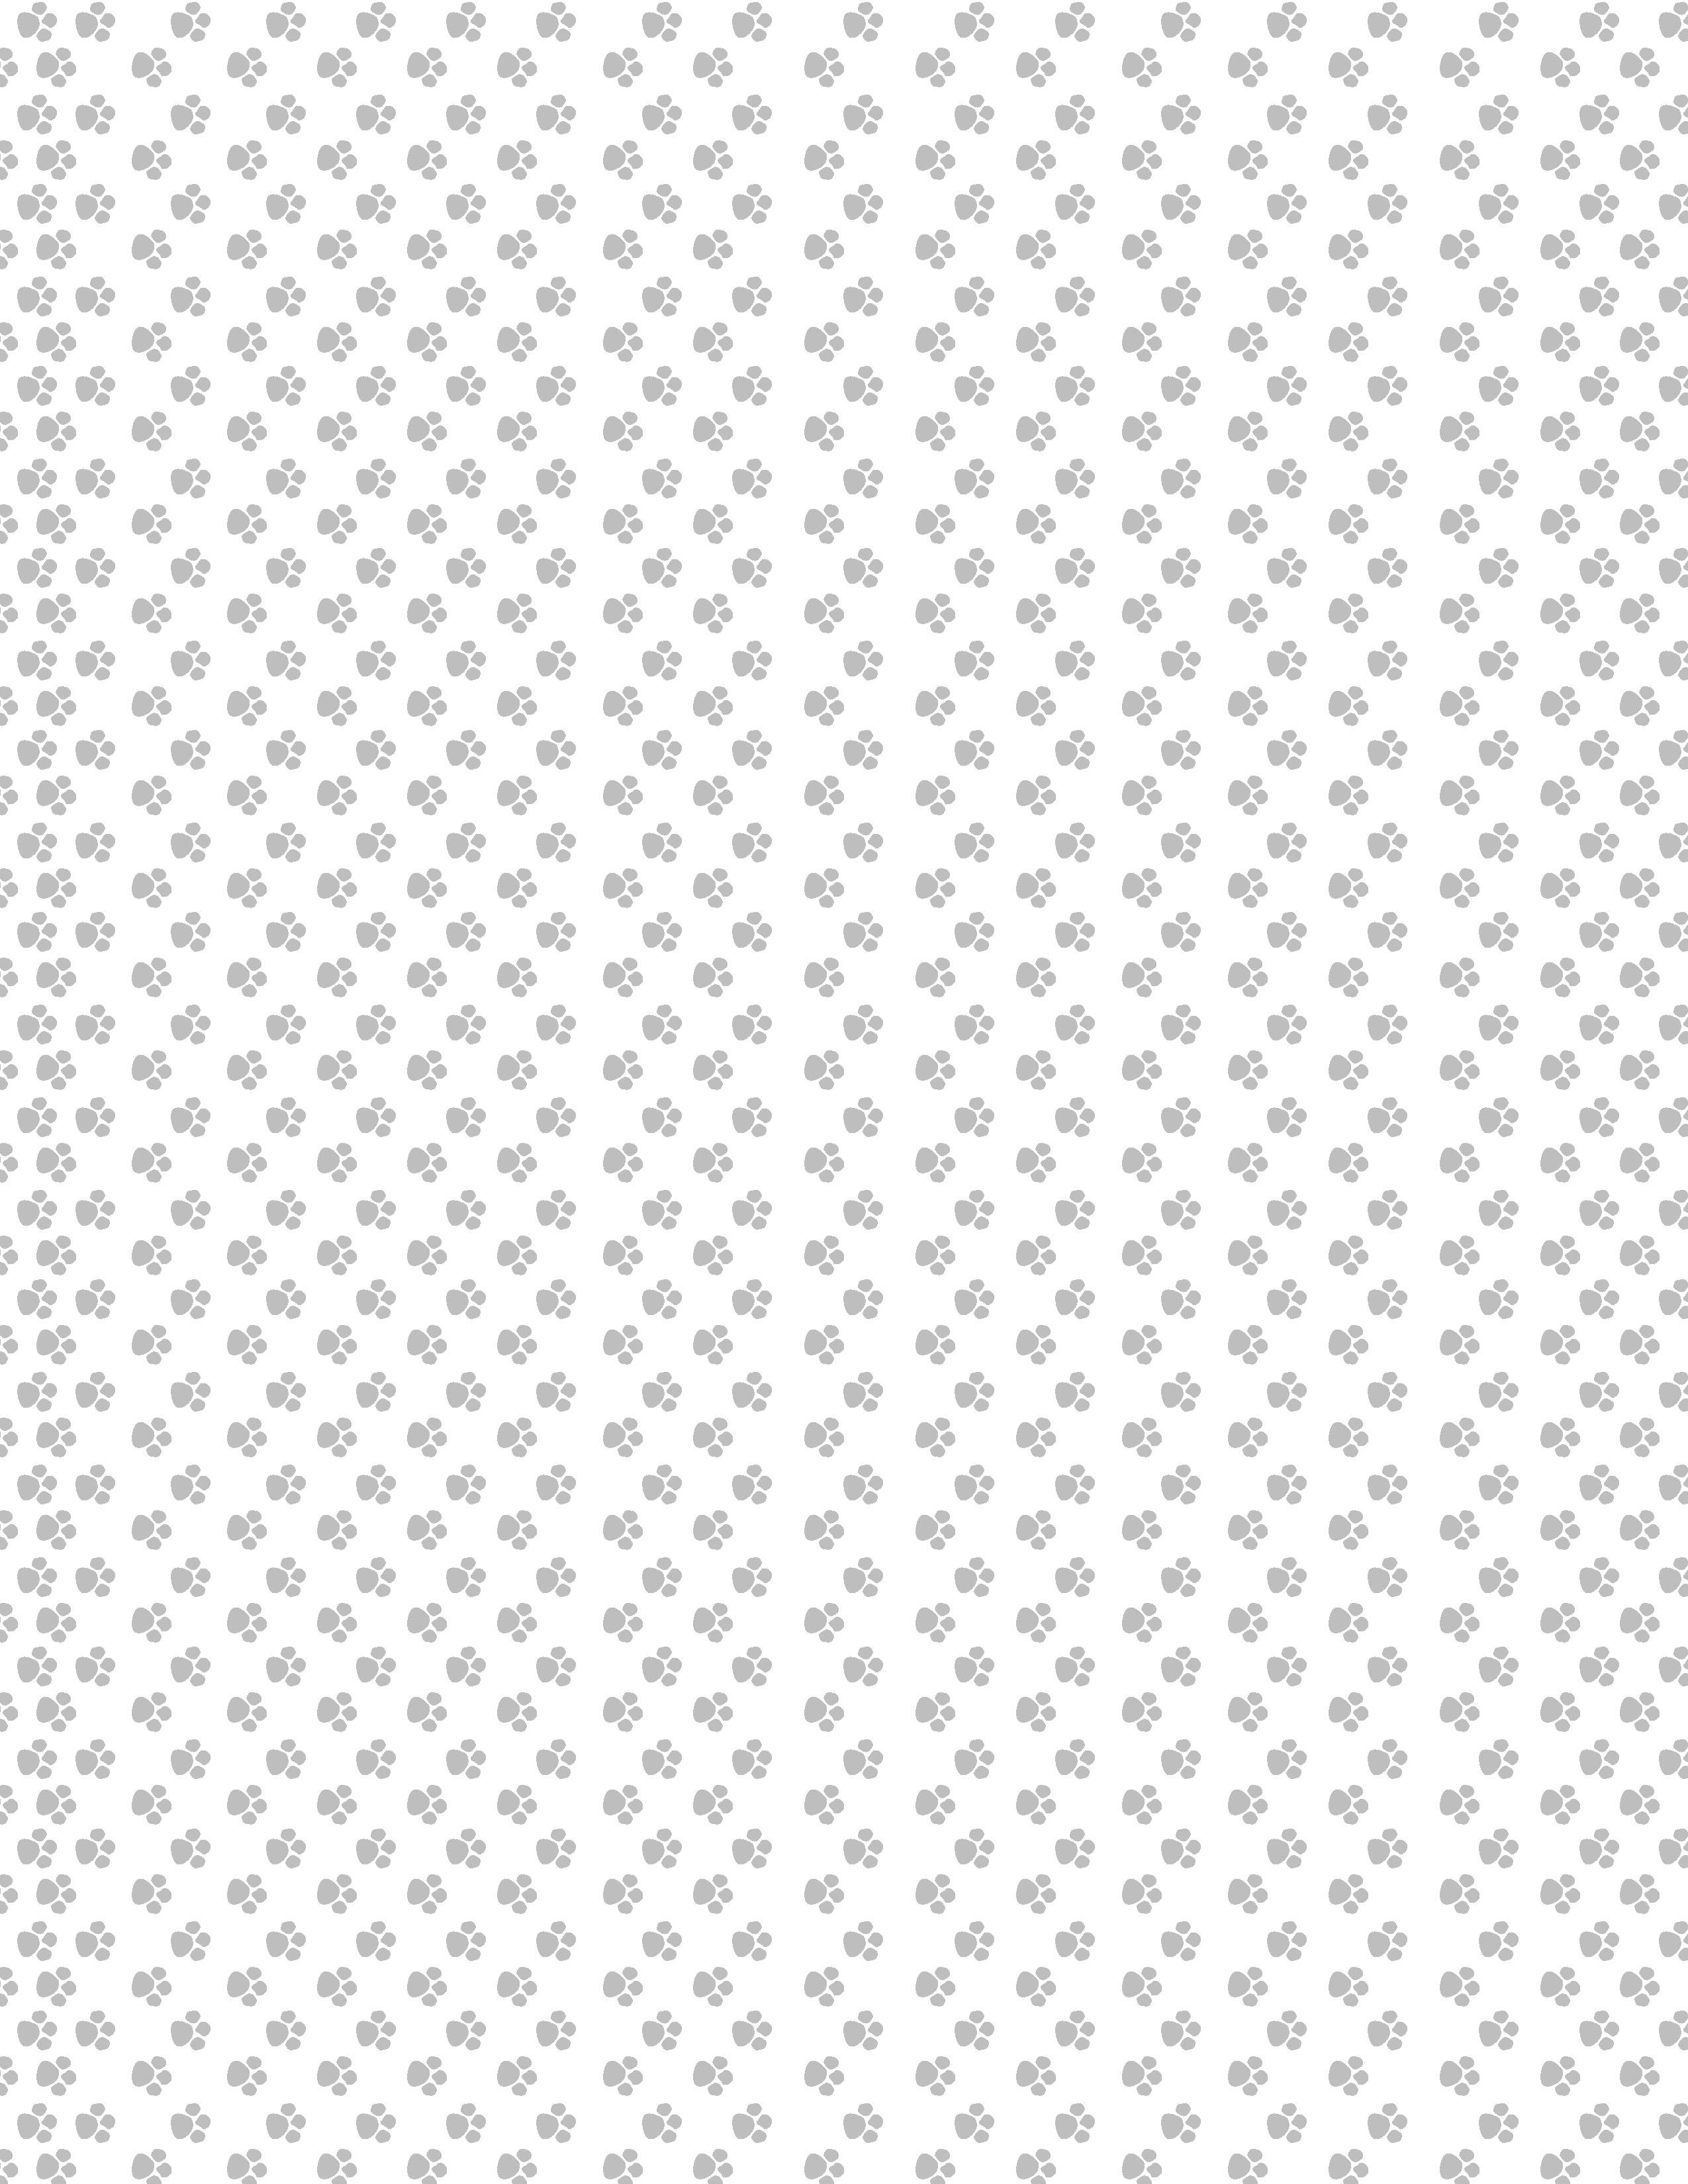 Paw Prints – Gray Background